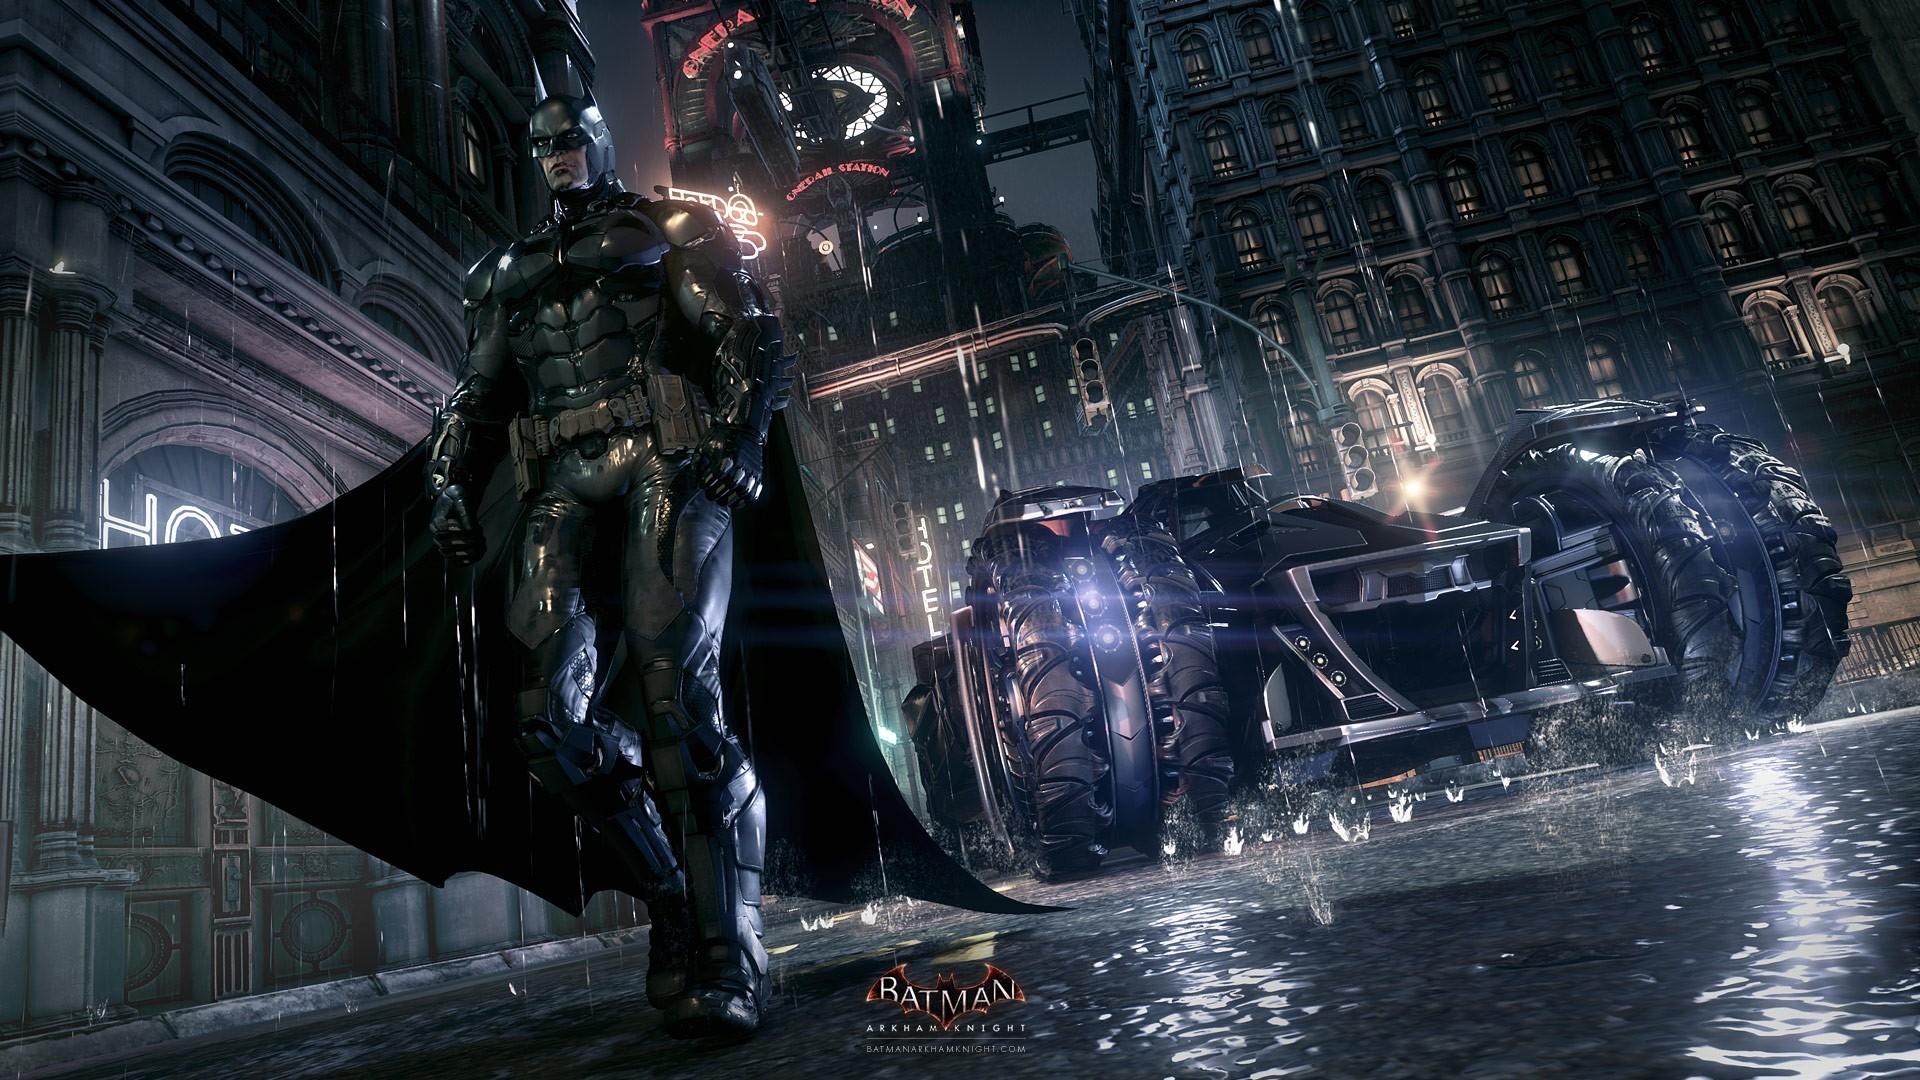 Batman Arkham Knight Wallpaper Arkham Knight by MinionMask on